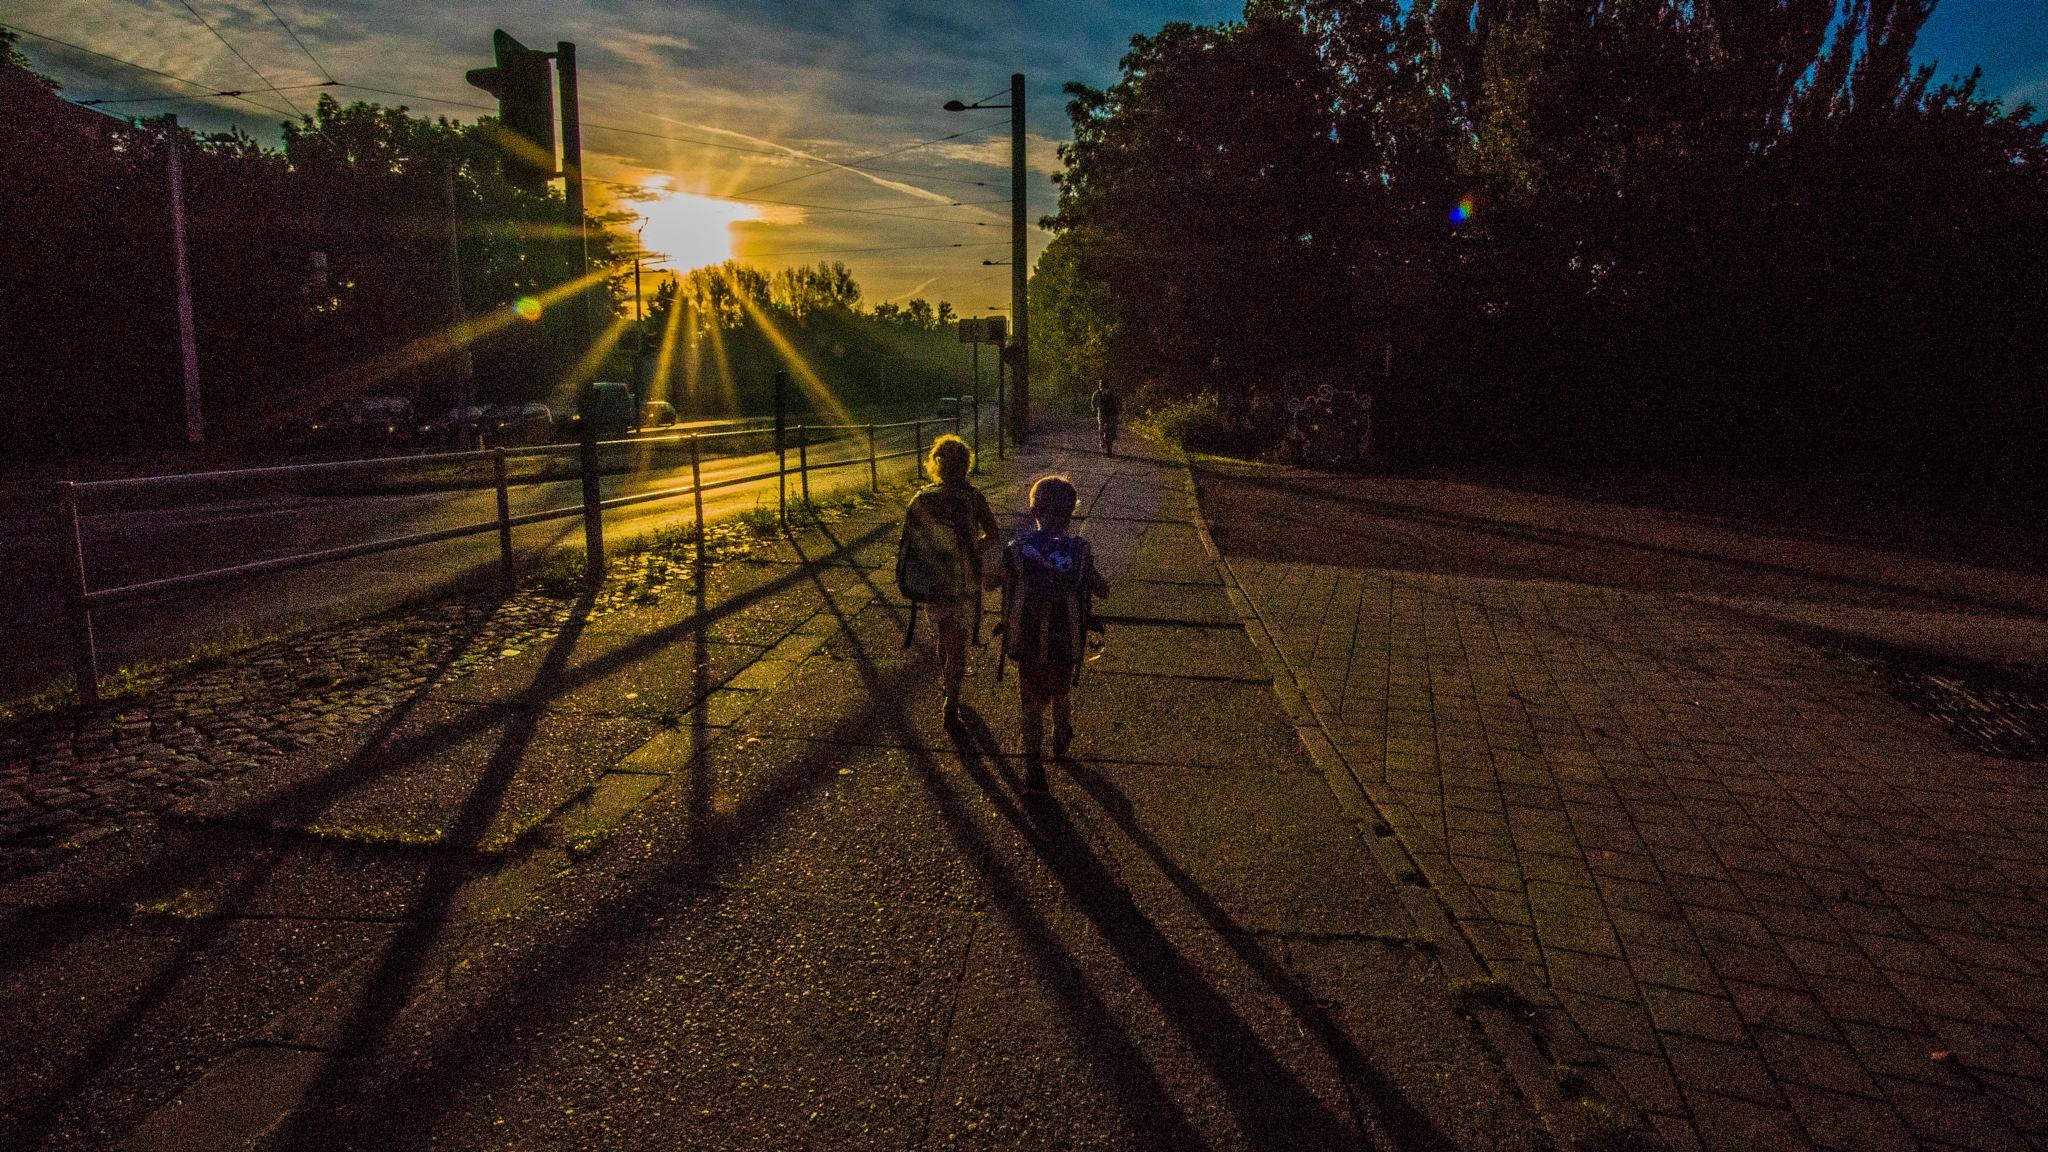 daybreak by Walter W. Price